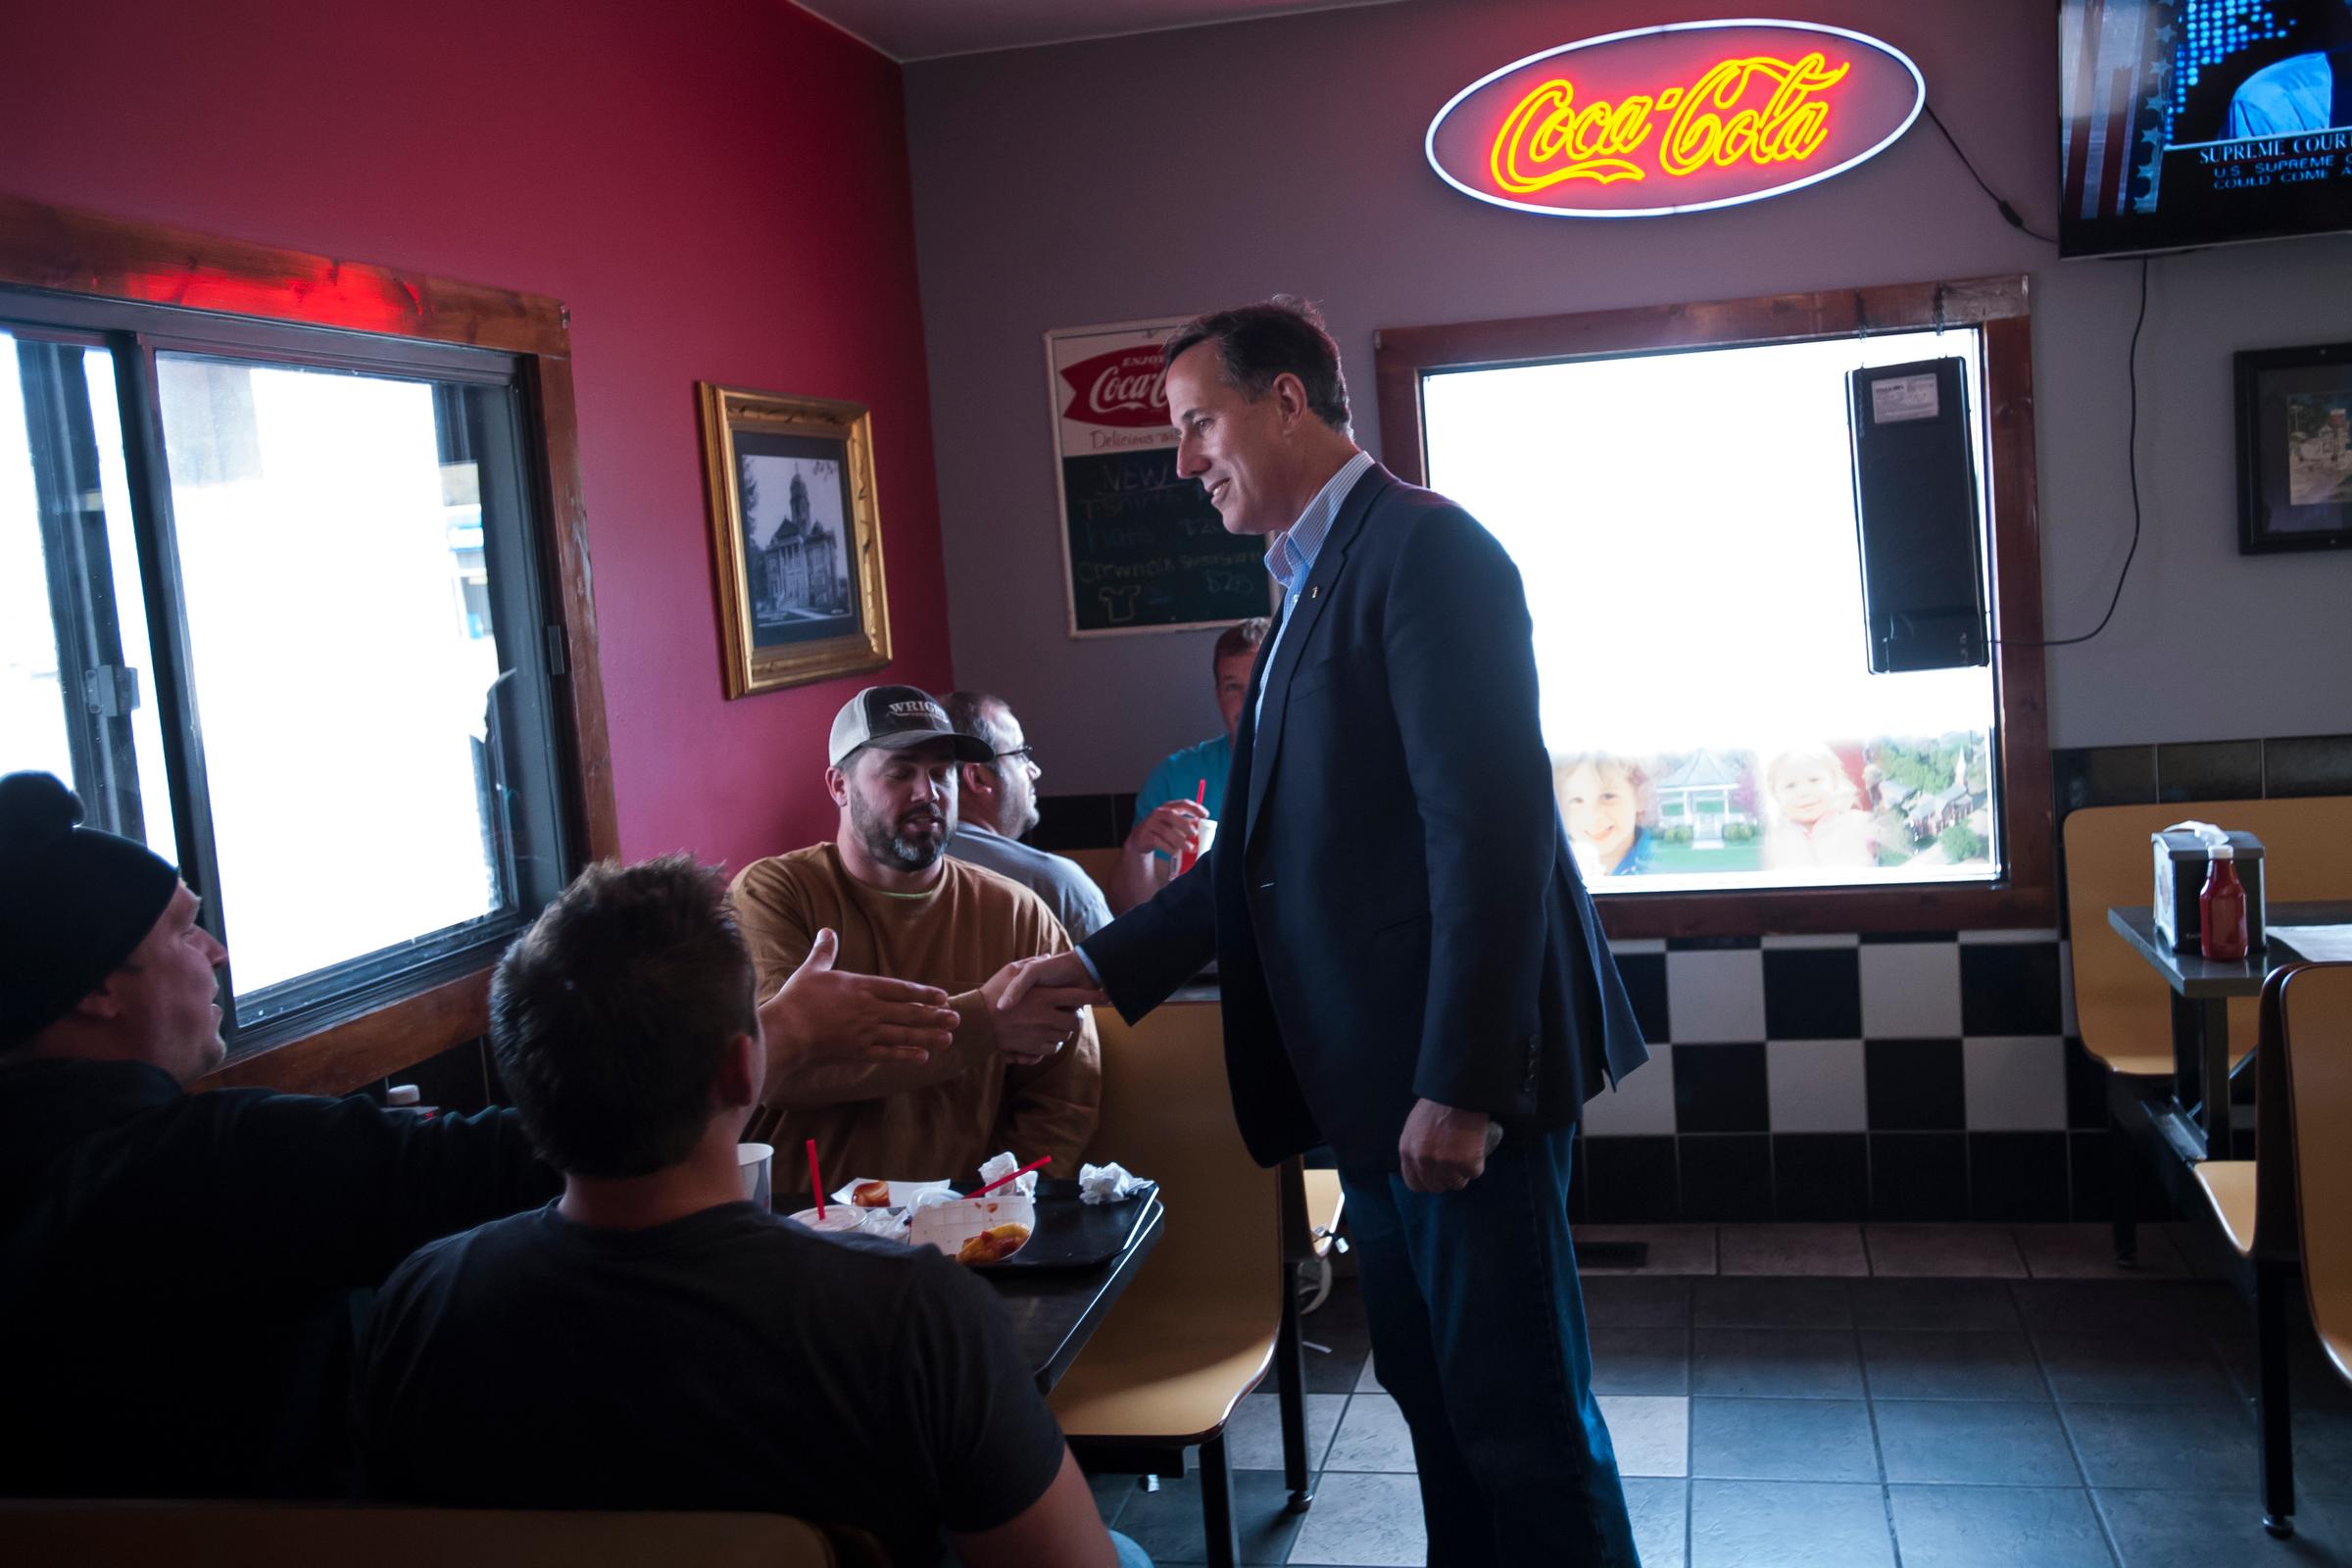 Republican presidential candidate Rick Santorum greets people having lunch at Bob's Drive Inn in Le Mars, Iowa.